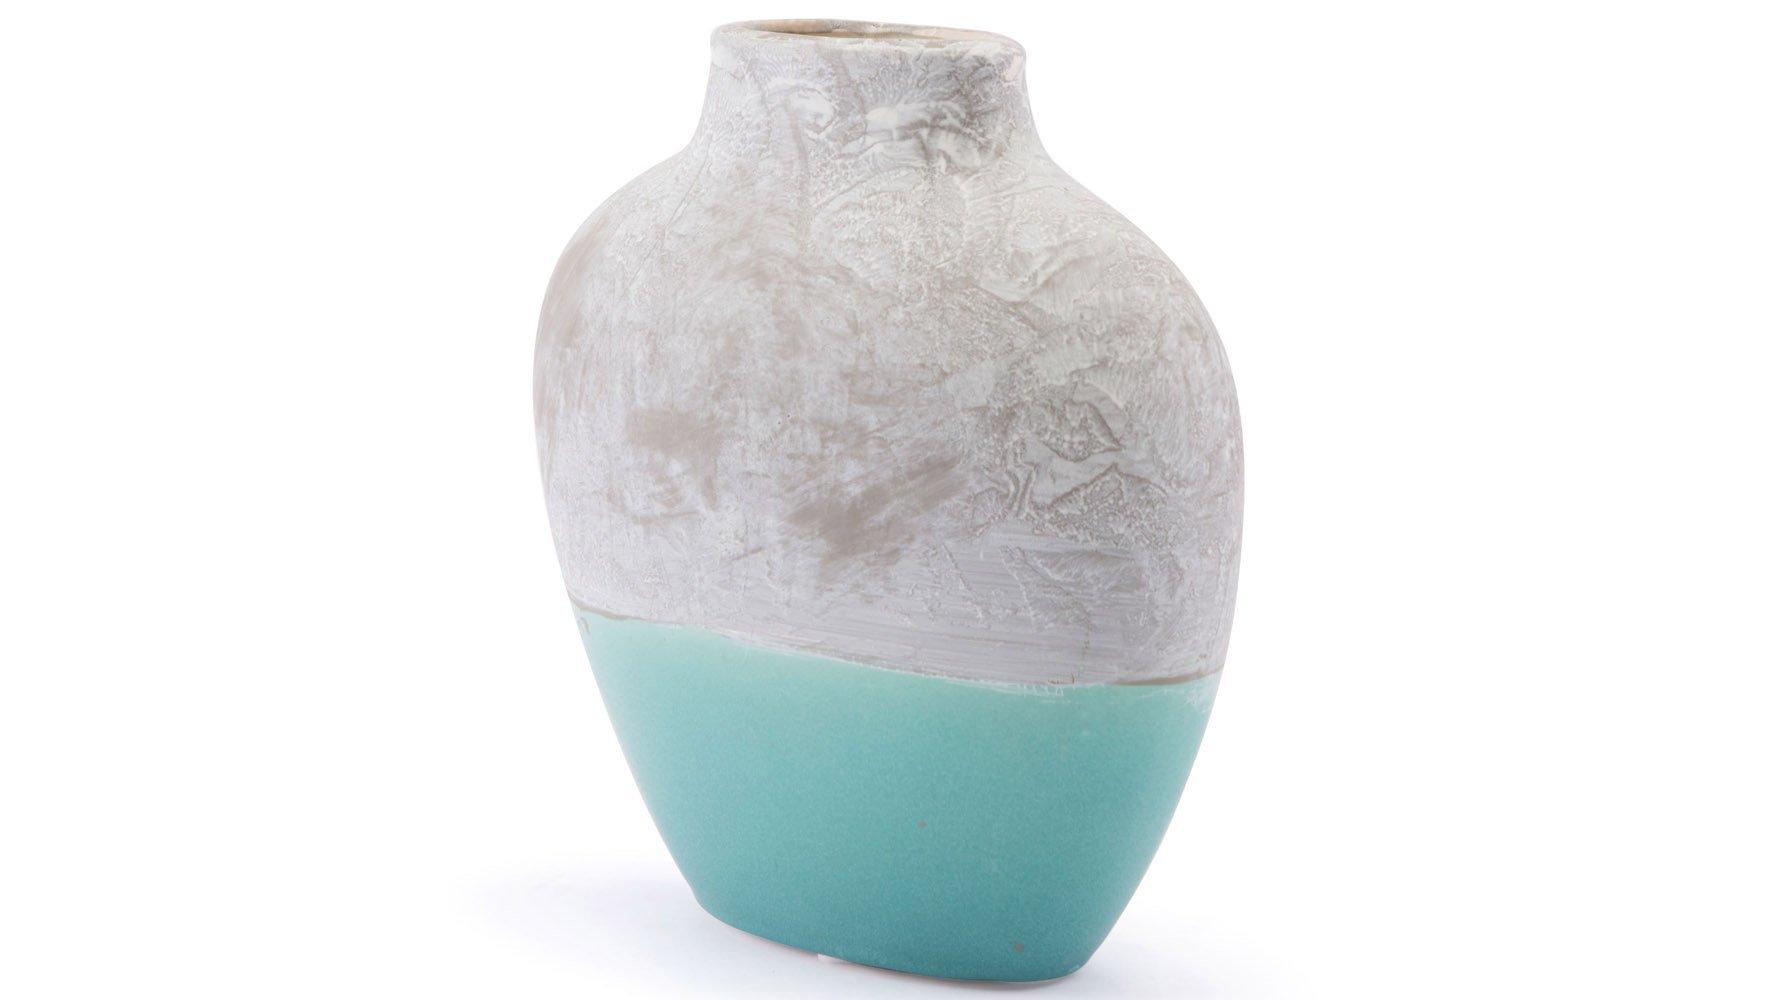 Azte Small Vase Gray Amp Teal Zuri Furniture